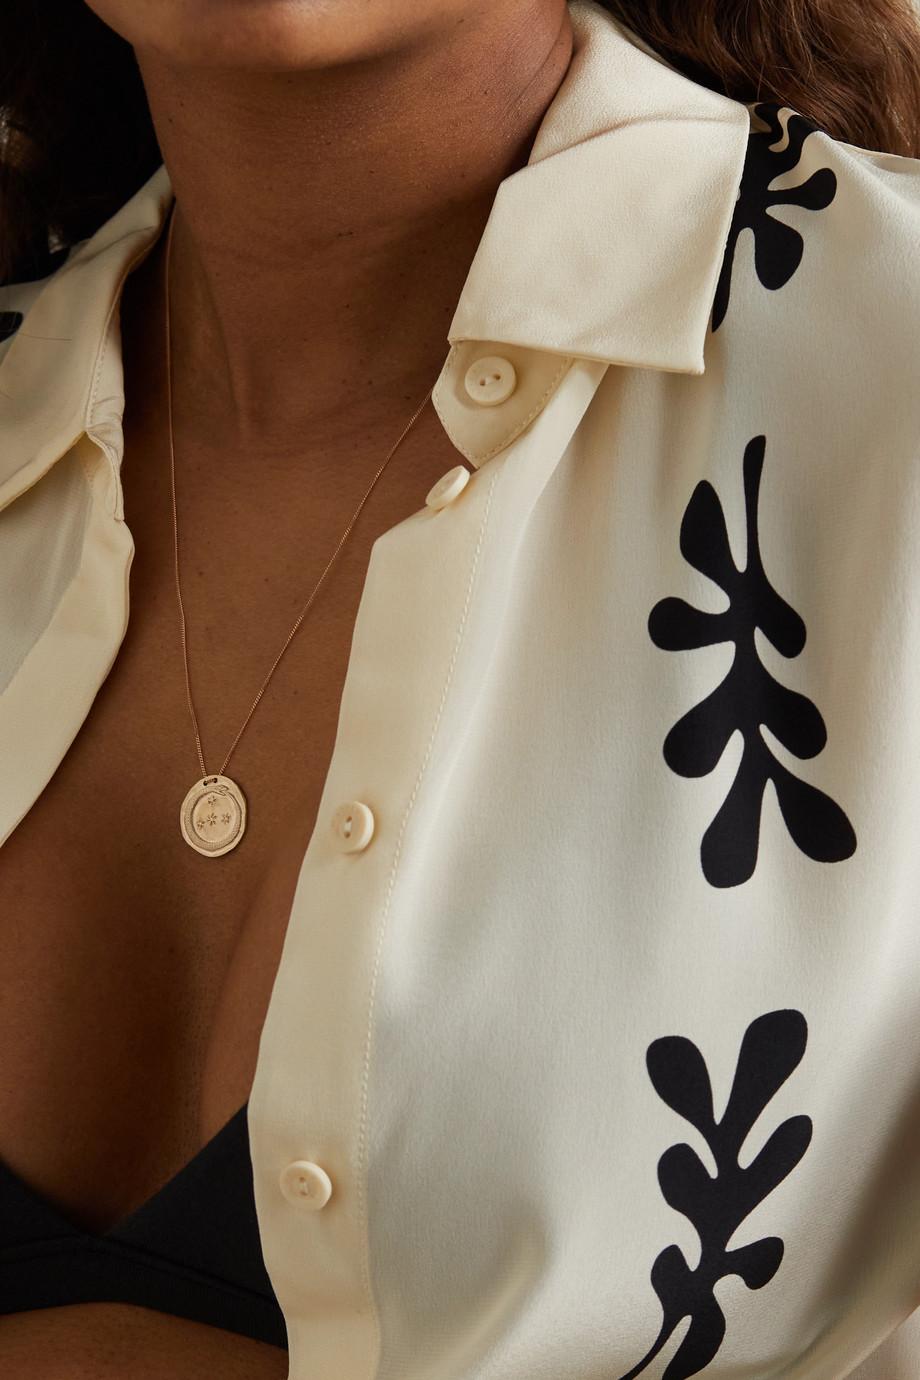 Pascale Monvoisin Idaho N°1 9-karat yellow and rose gold diamond necklace